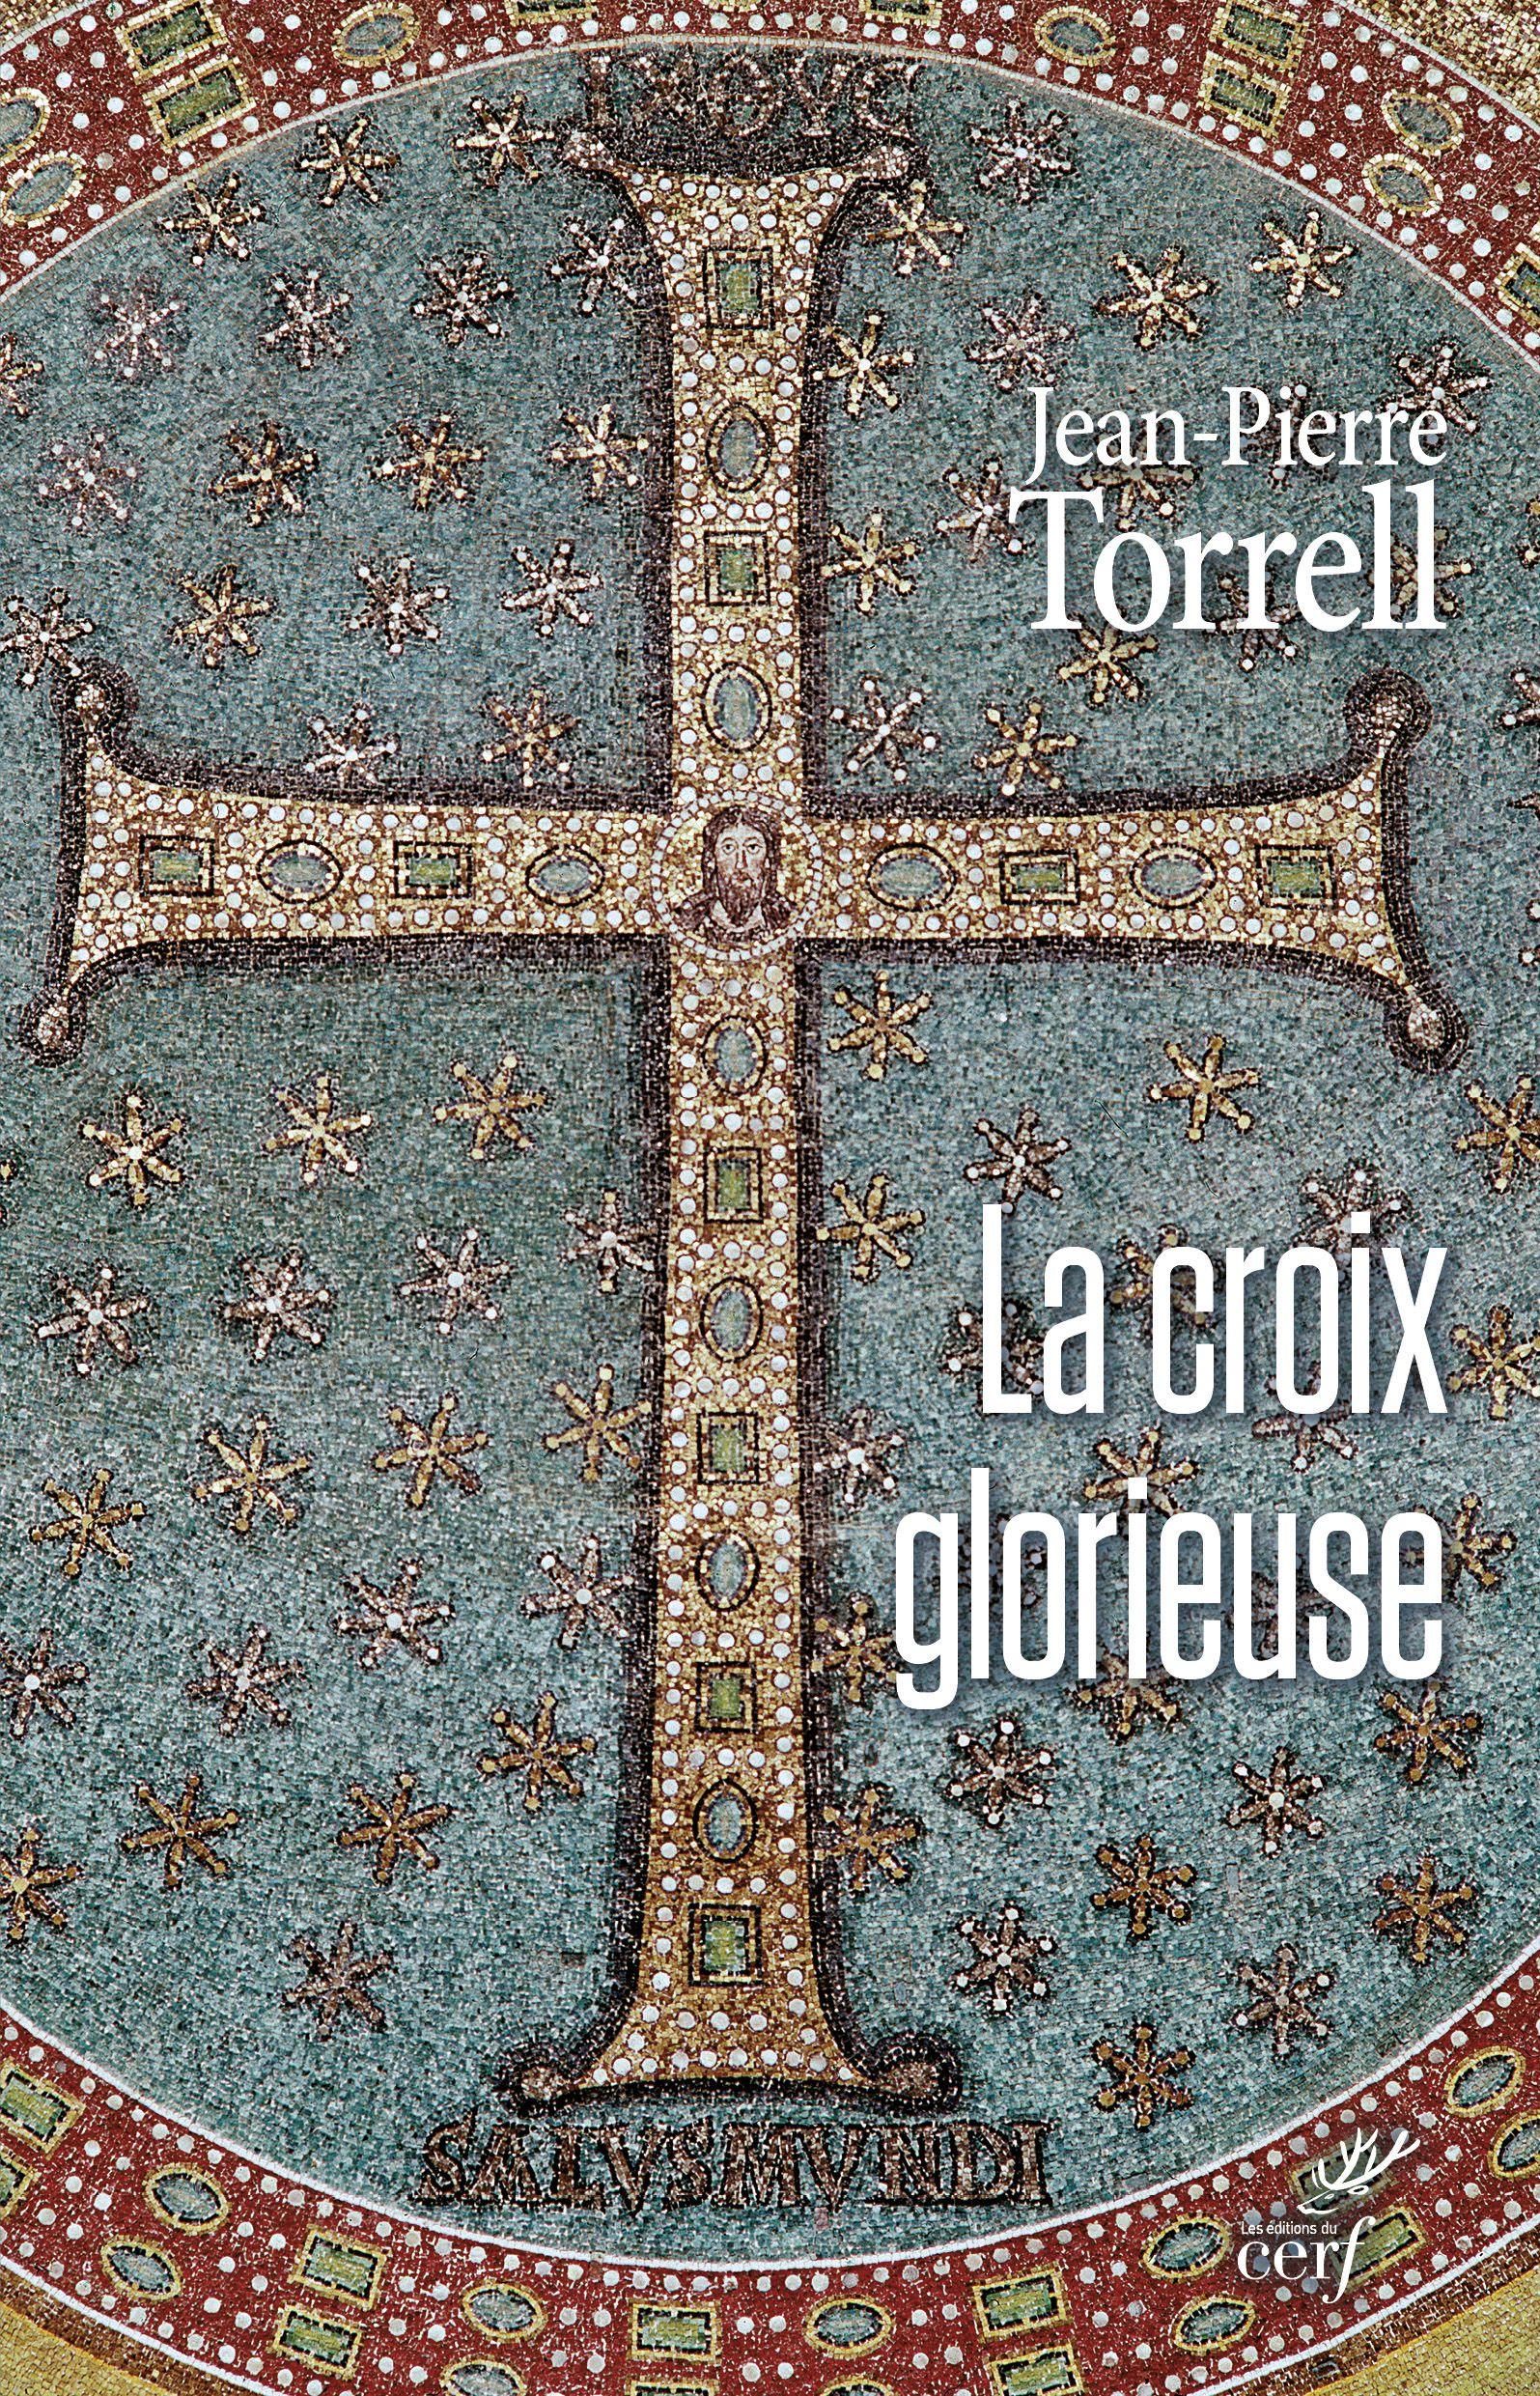 La Croix glorieuse de Jean-Pierre Torrell. http://www.editionsducerf.fr/